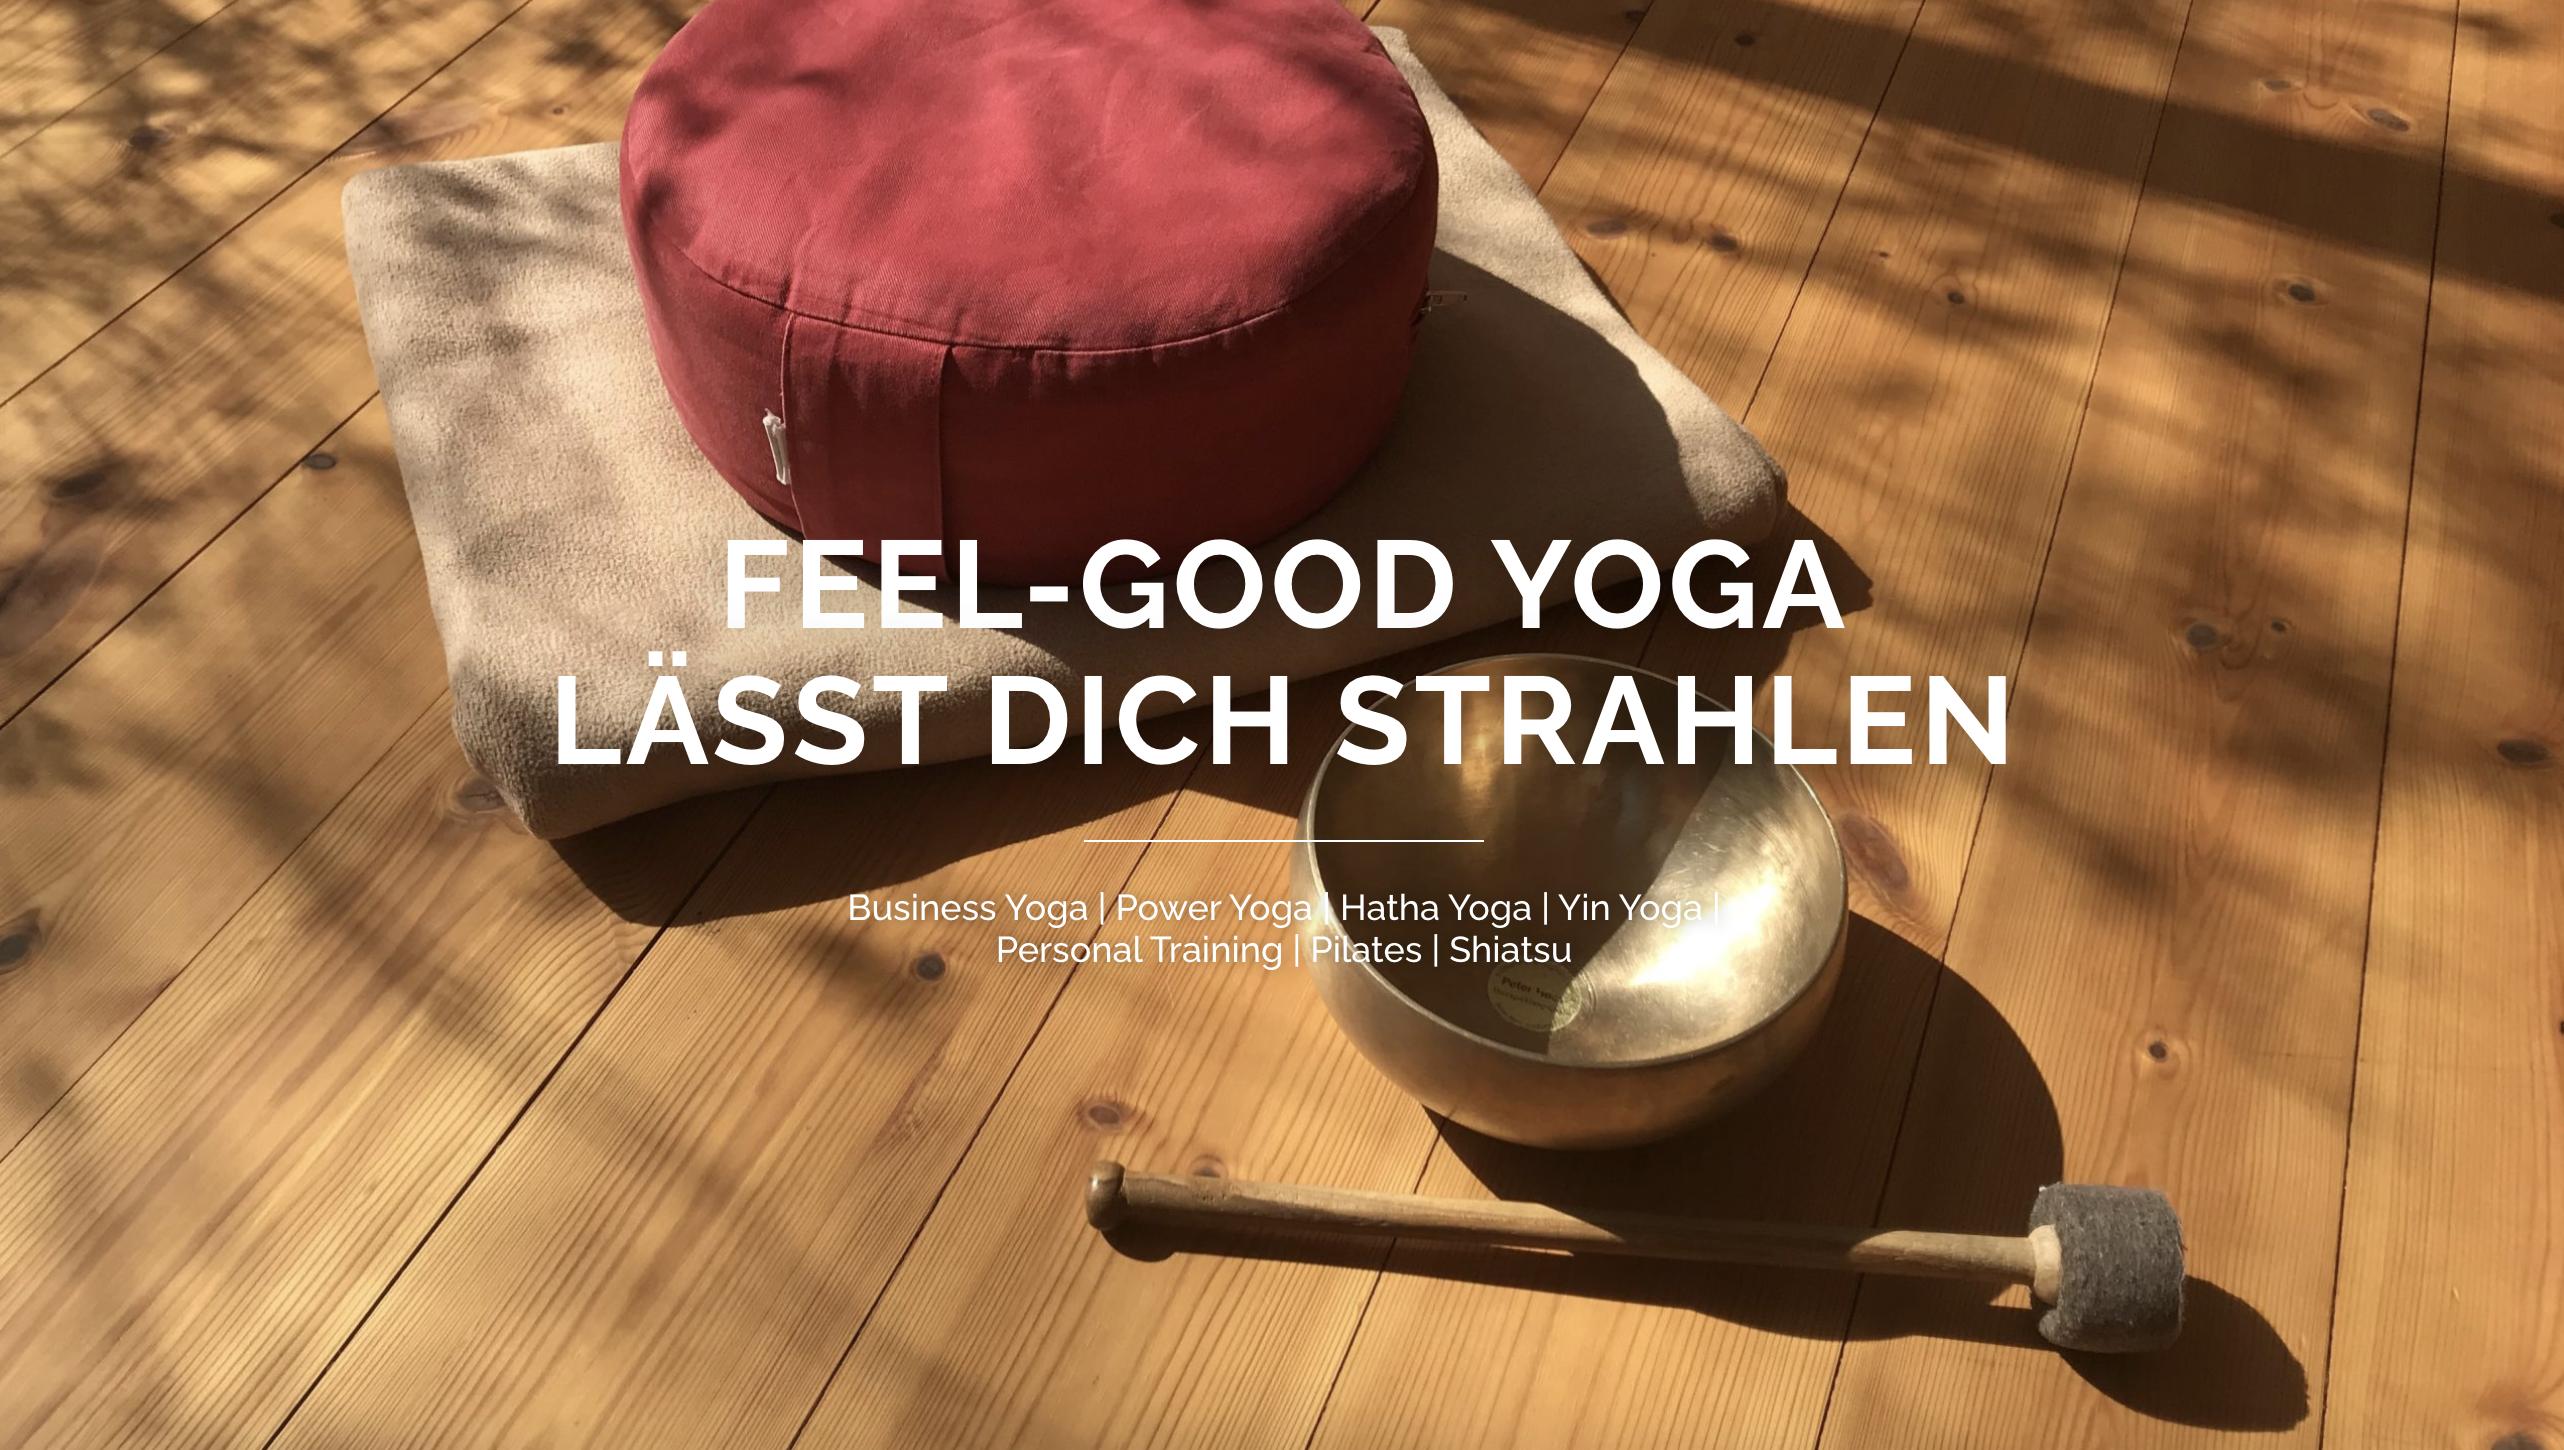 Yoga Feel-Good Hamburg Volksdorf Ahrensburg Entspannung Meditation Bianca Pagel